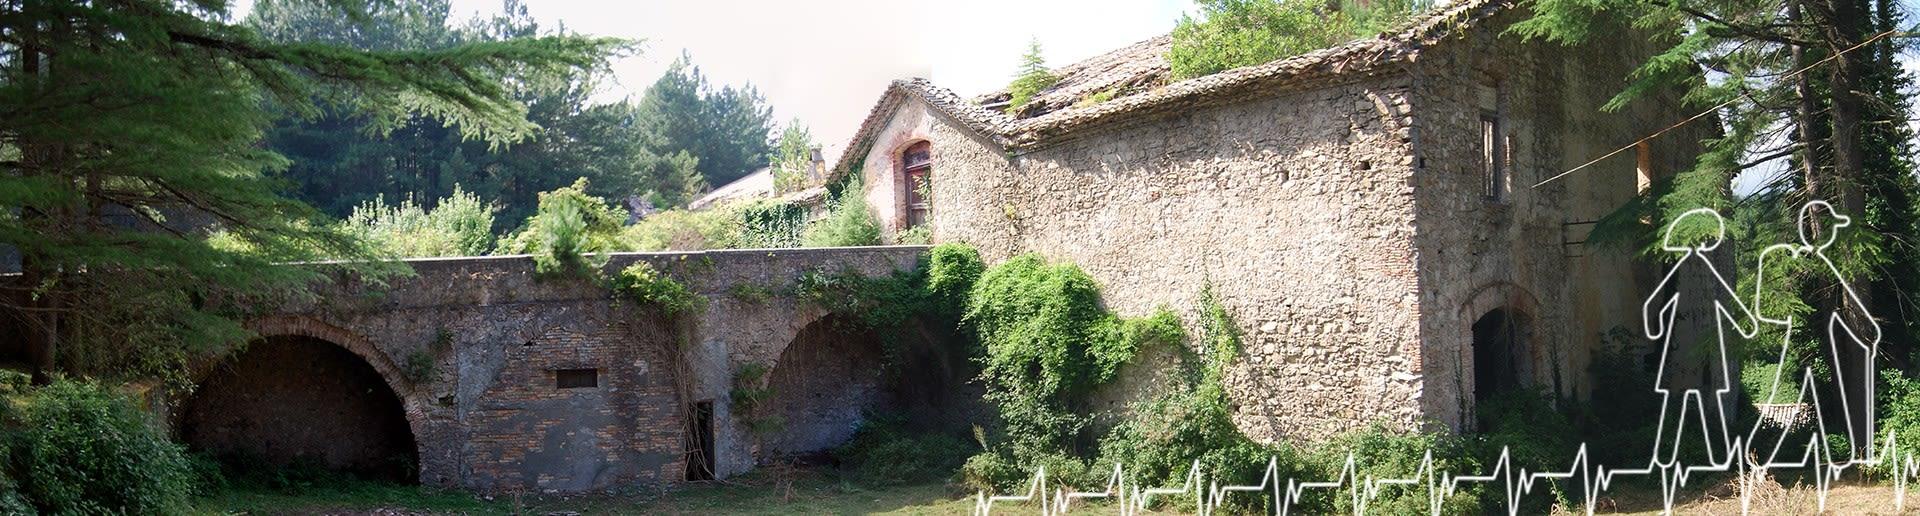 Ferdinandea (Stilo); Magazzini ex fonderia di Ferdinandea